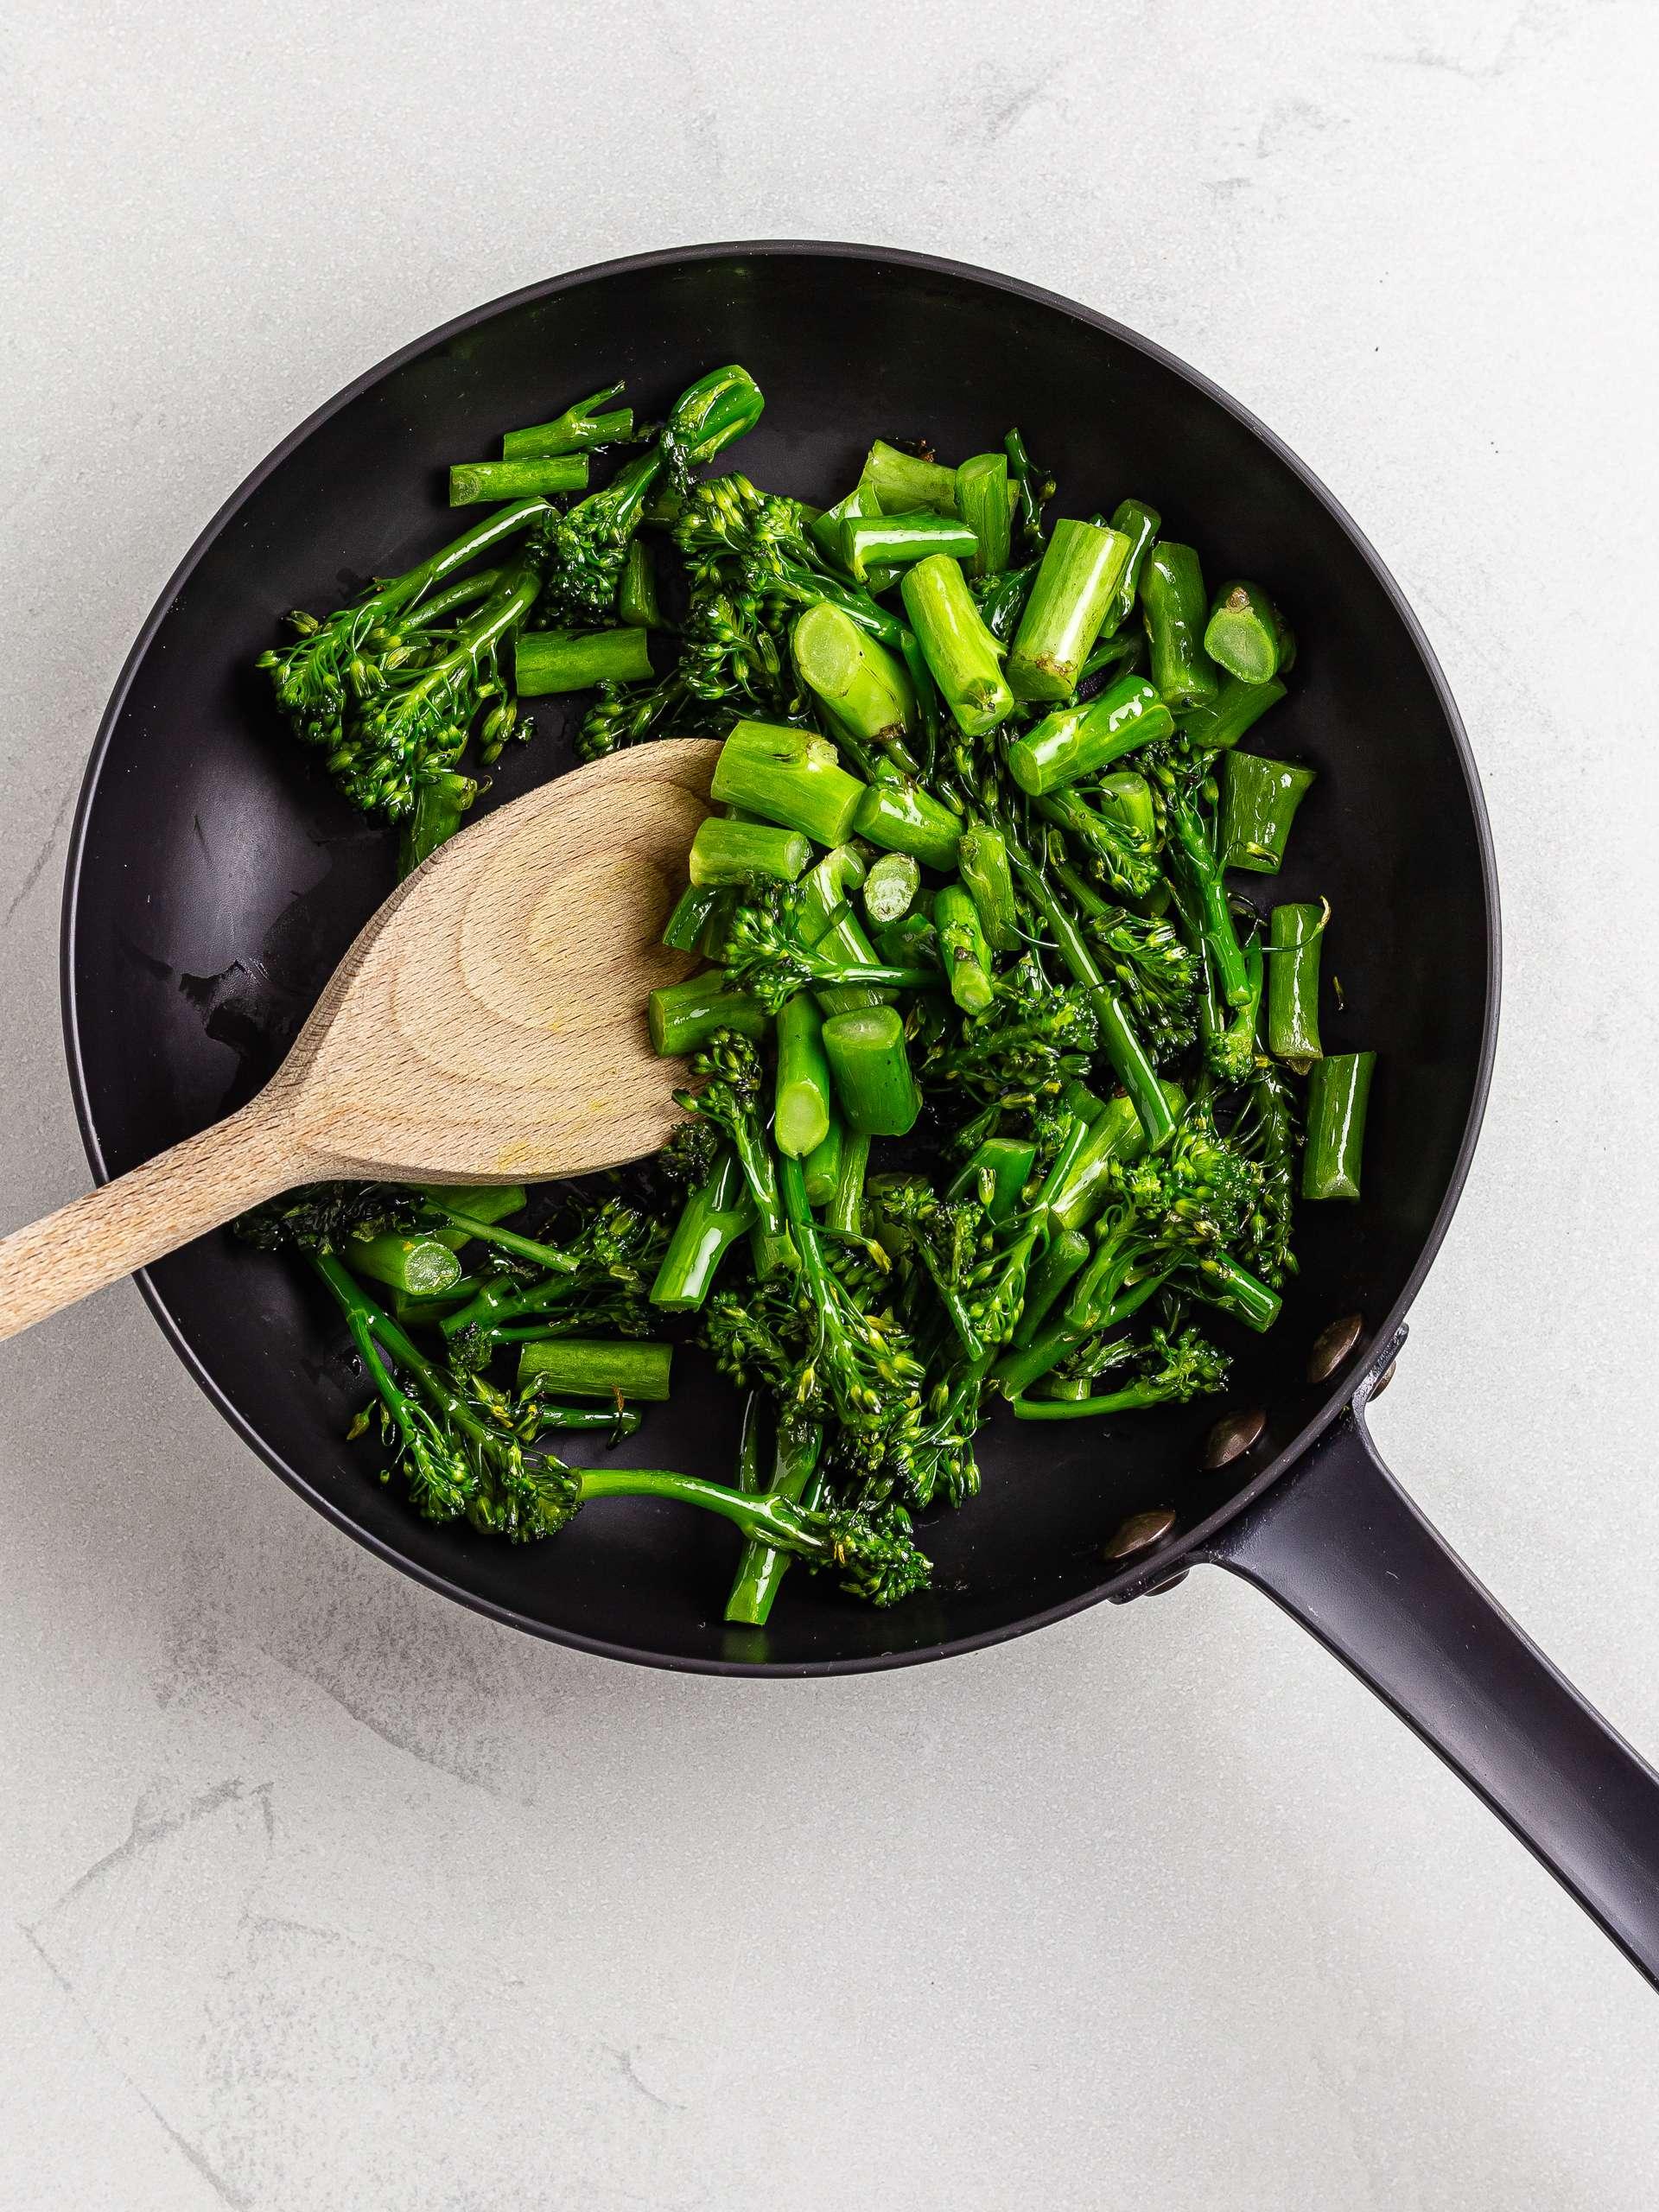 sauteed tenderstem broccoli in a skillet